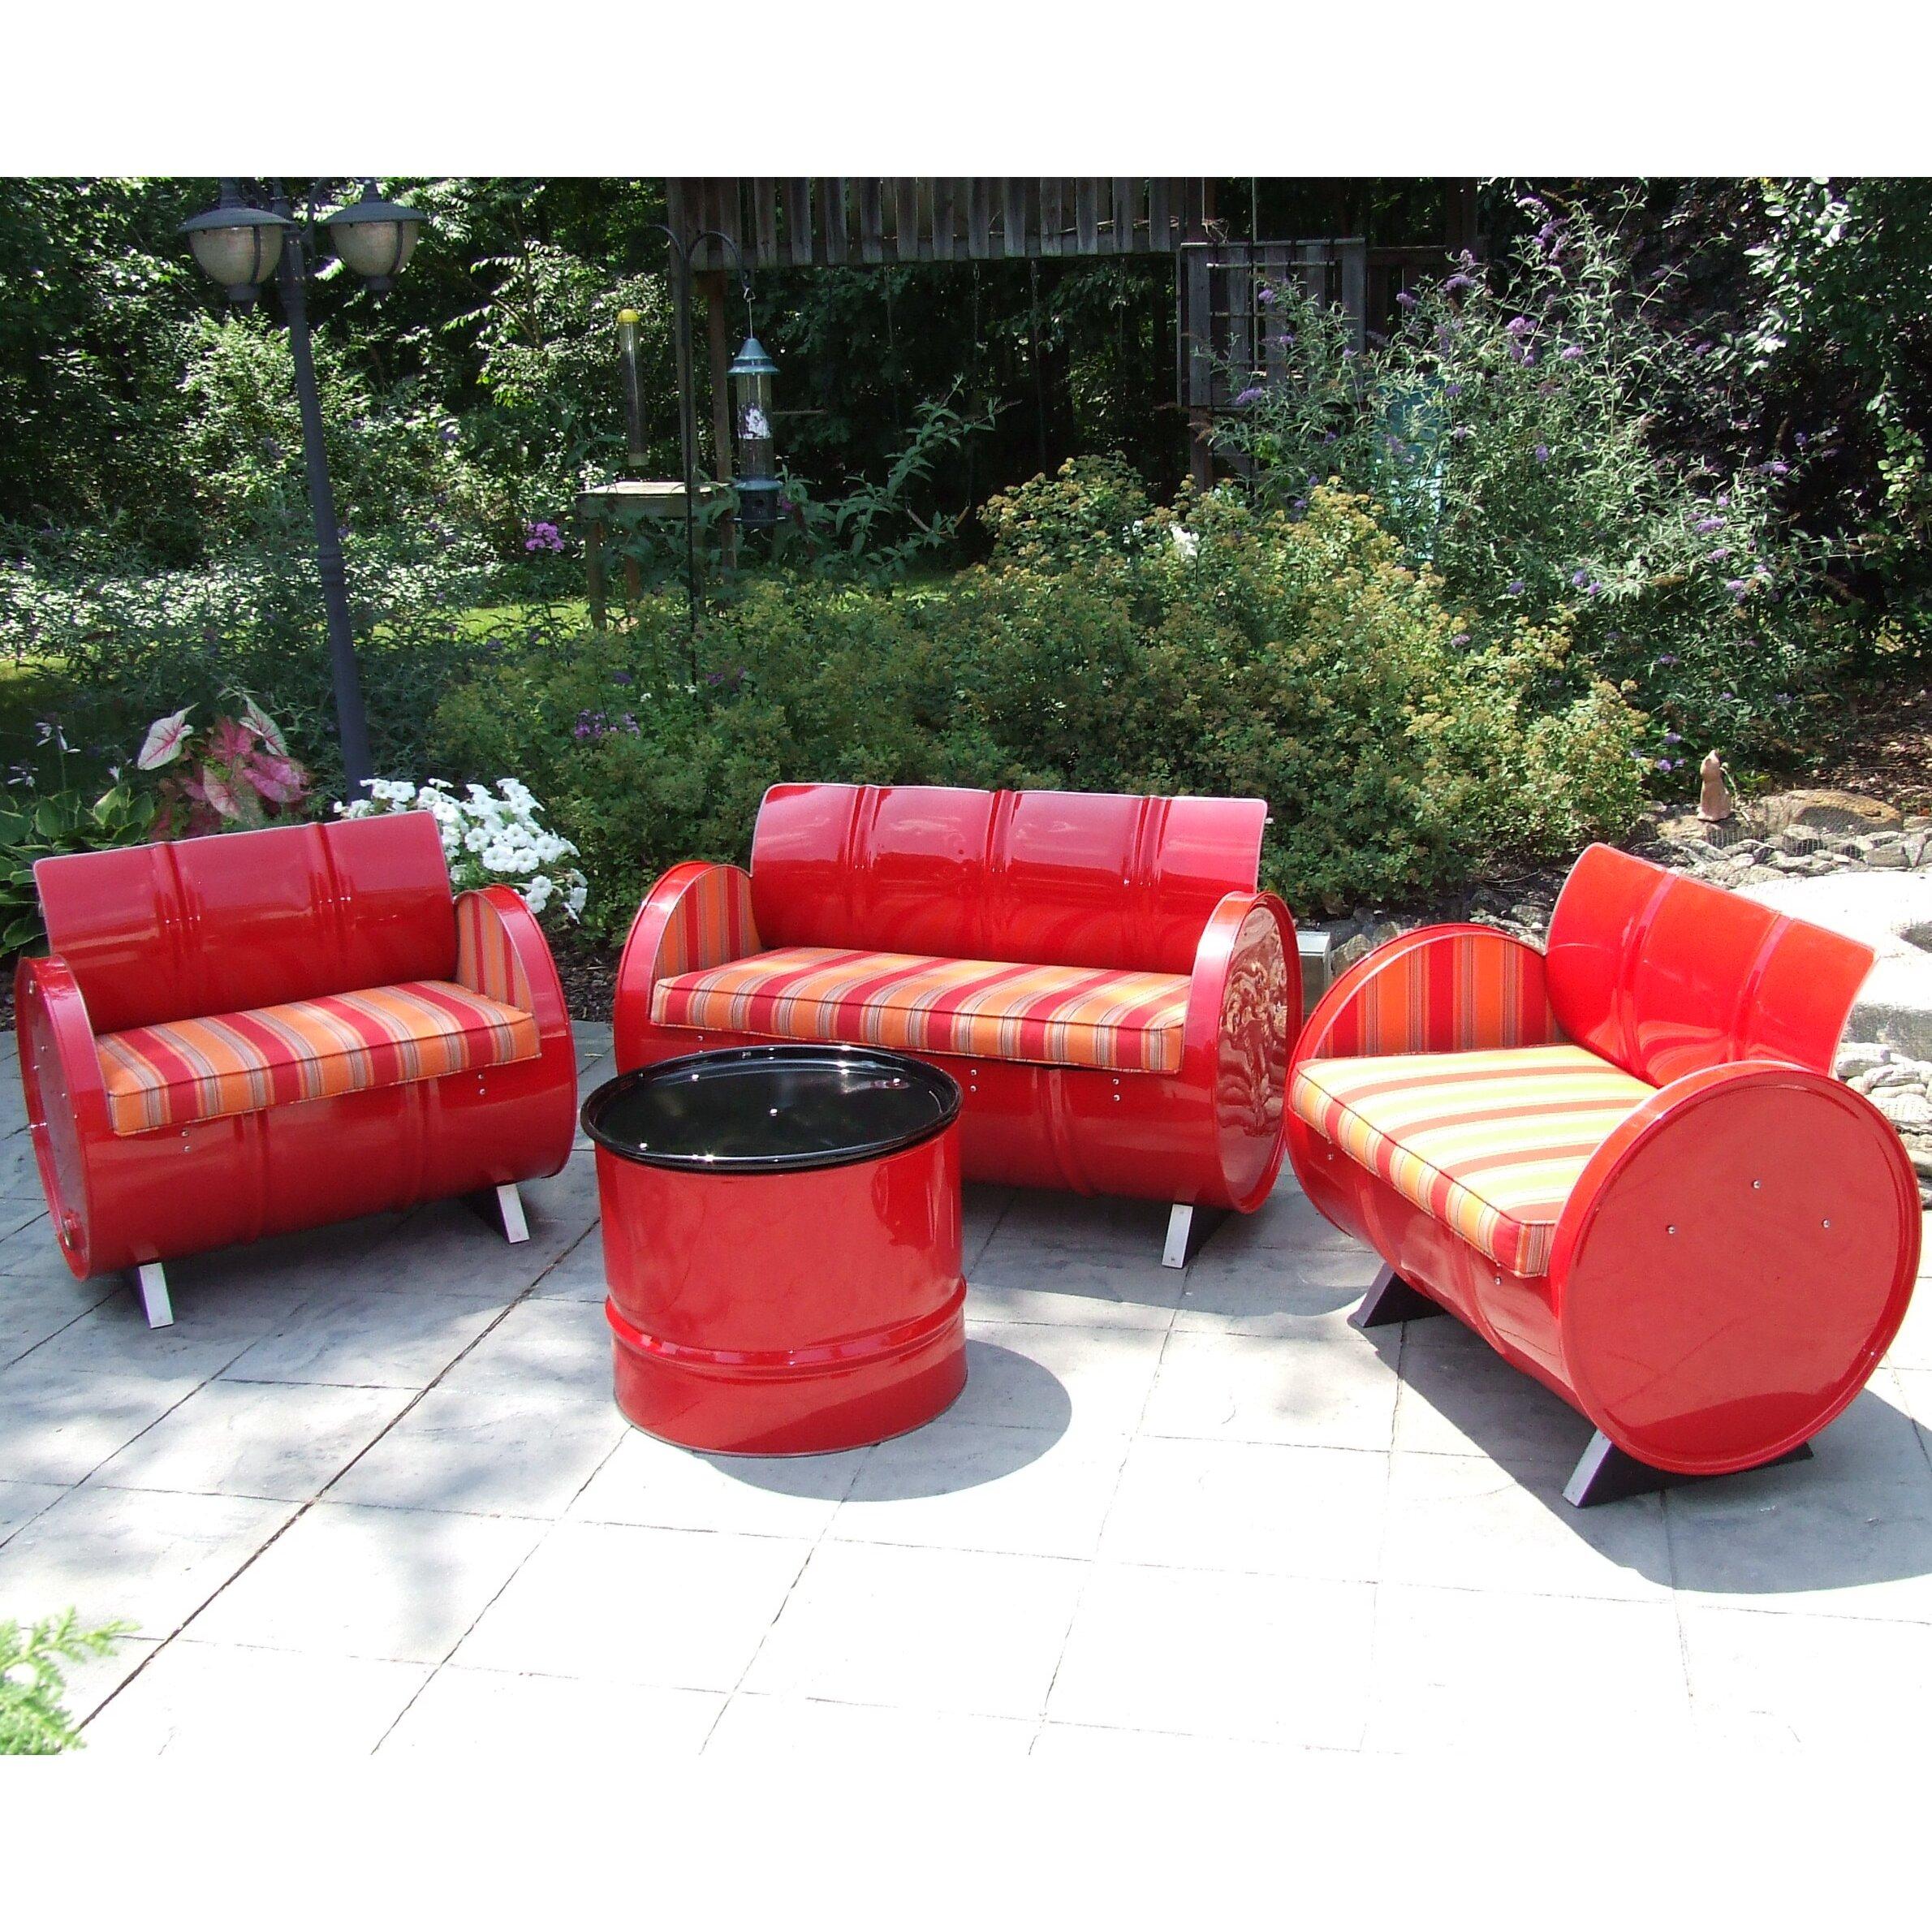 Drum works furniture bravada salsa indoor outdoor garden for Indoor and outdoor furniture